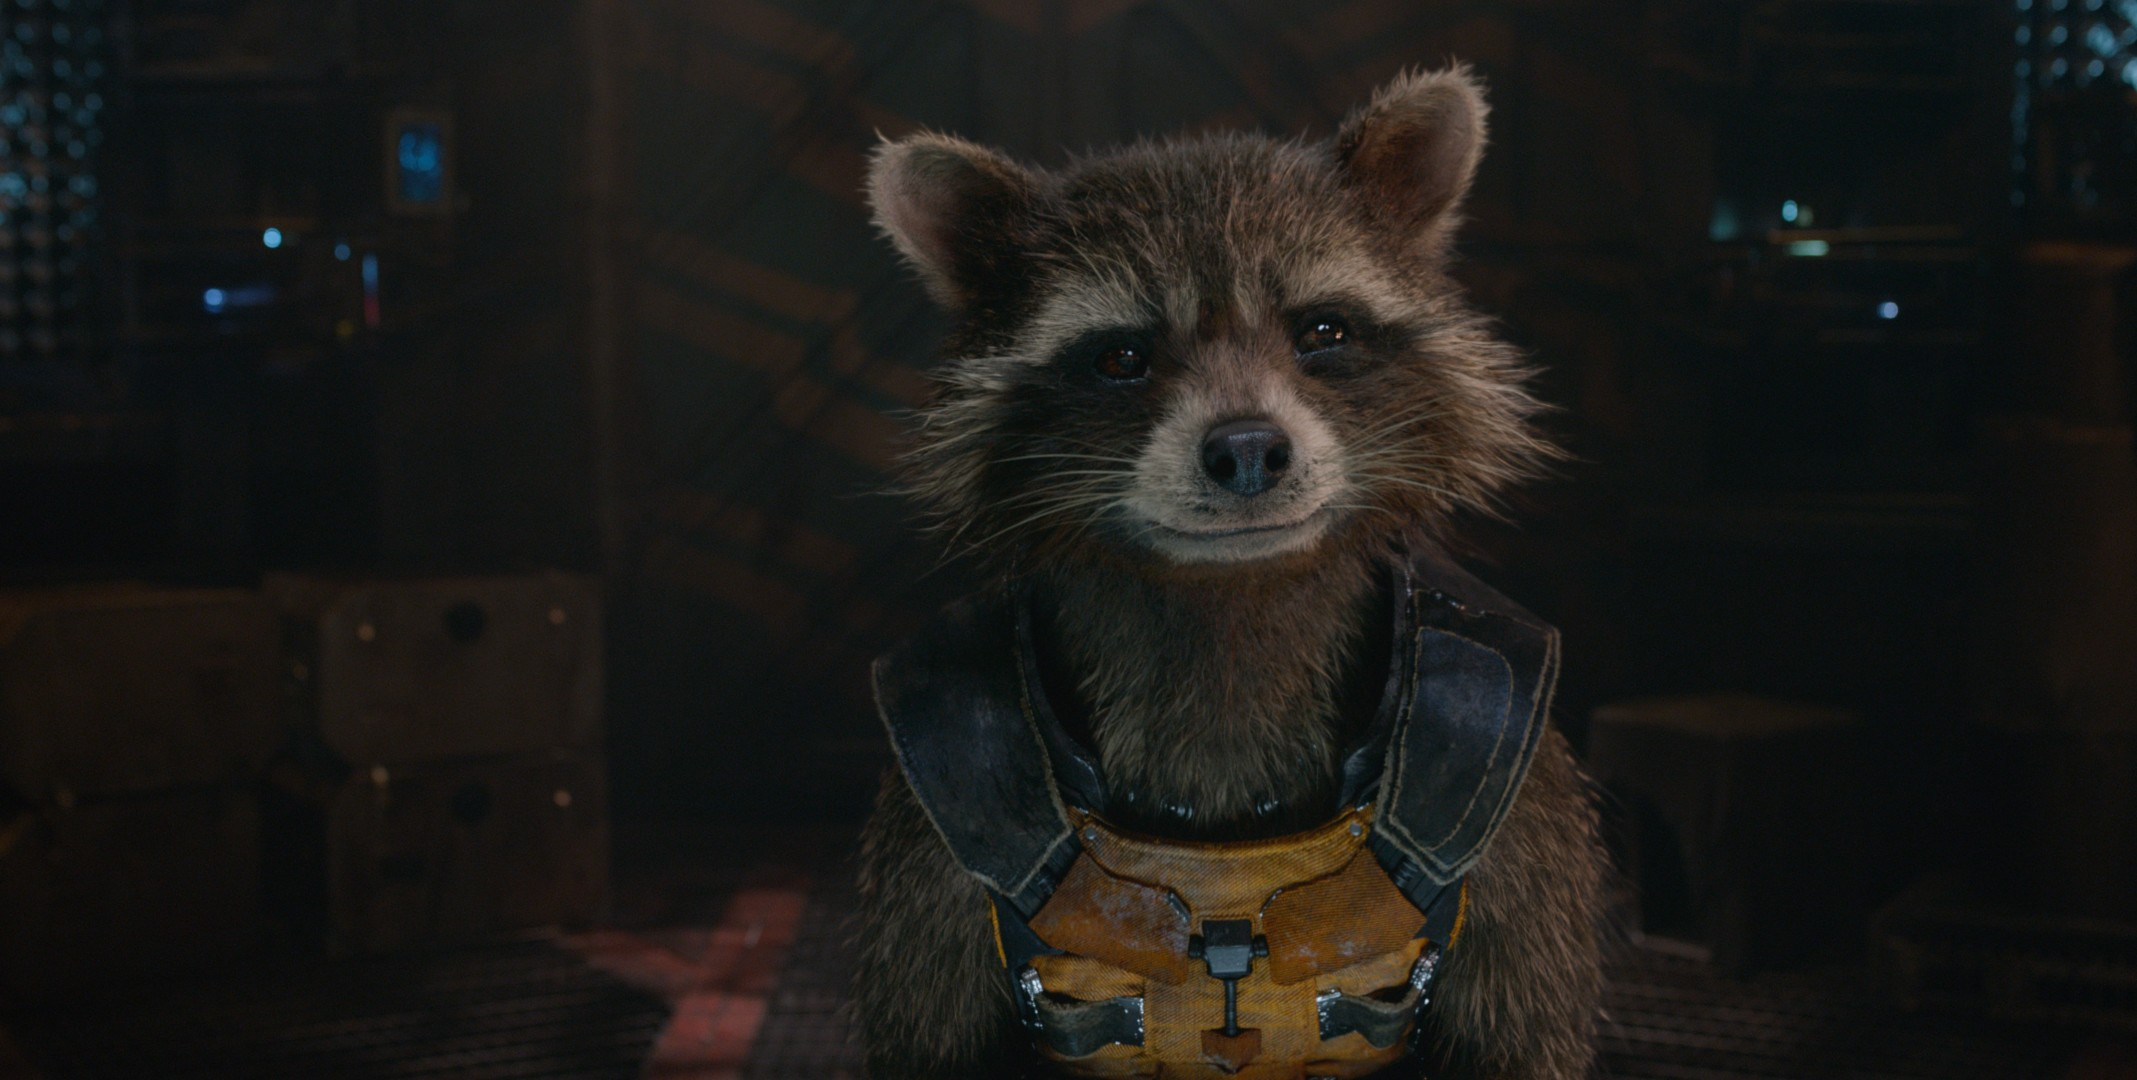 Rocket raccoon guardians of the galaxy hd movies 4k - Rocket raccoon phone wallpaper ...